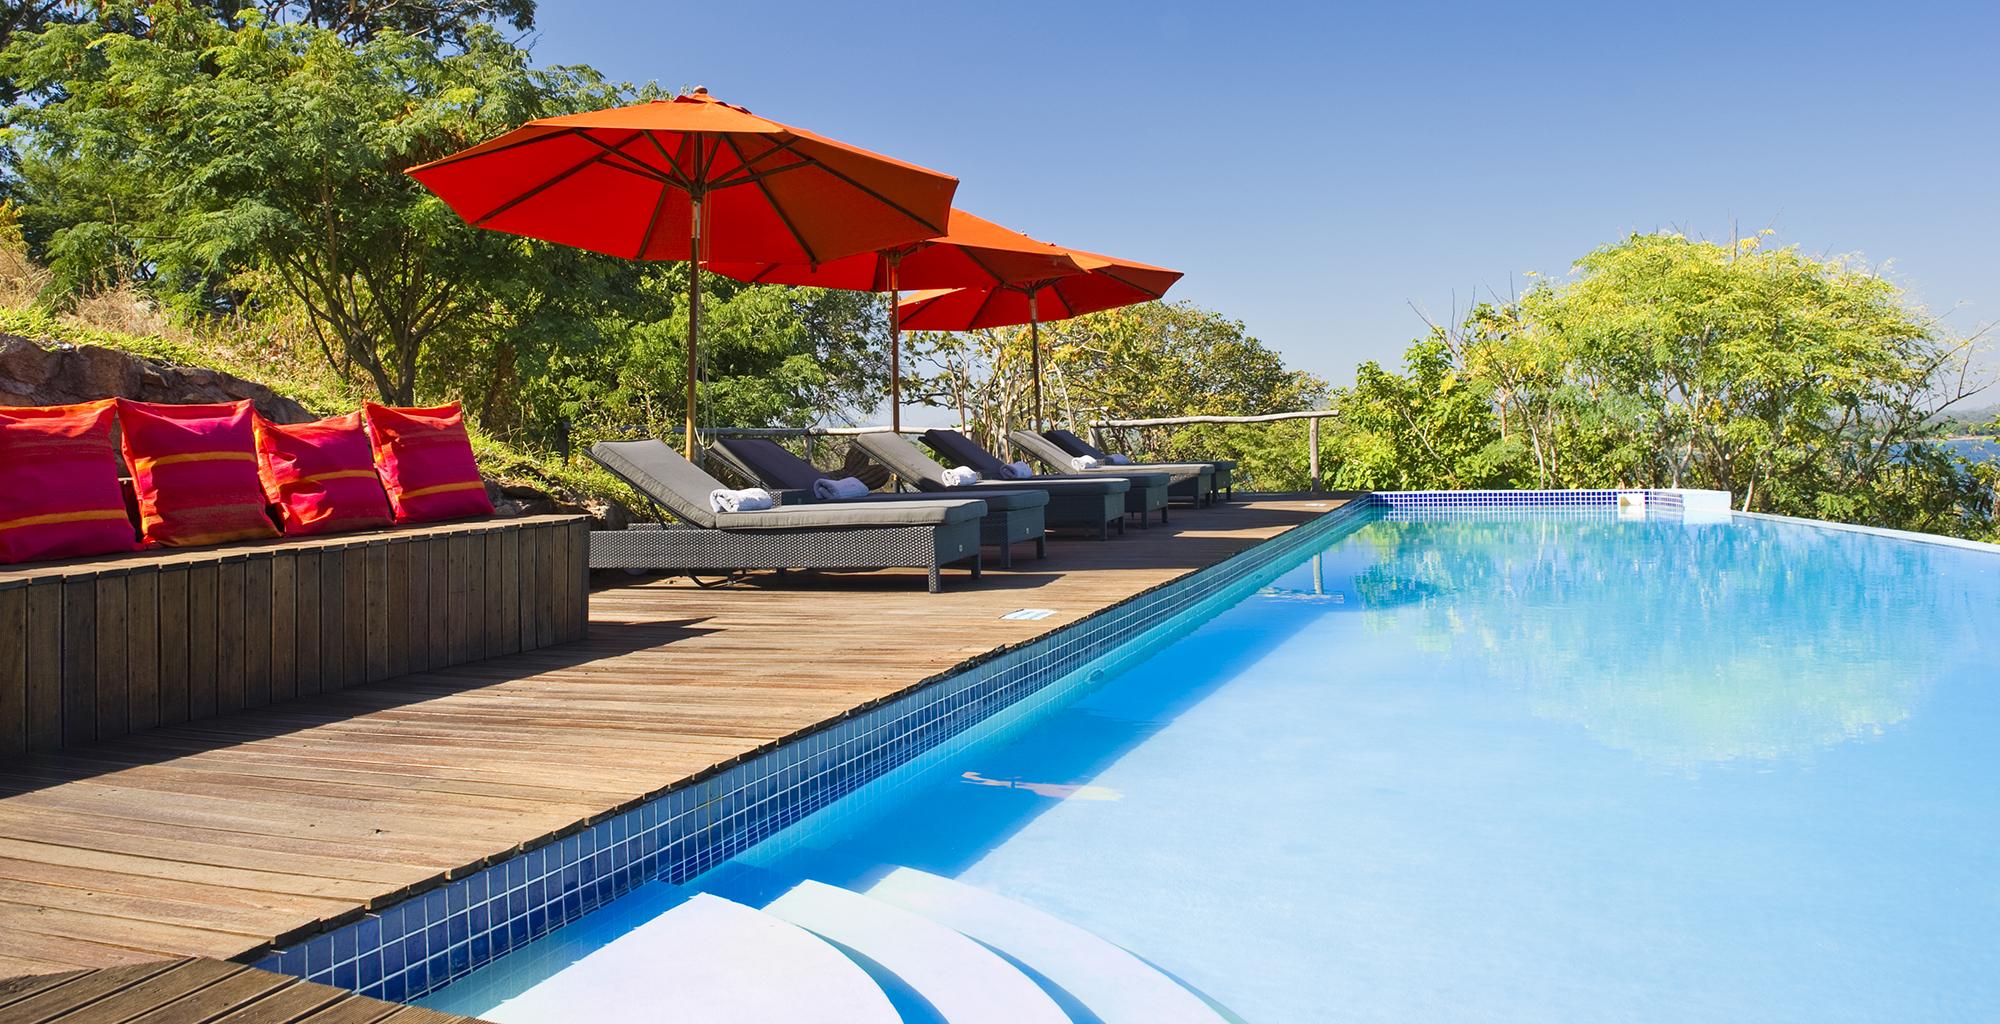 Lake-Malawi-Pumulani-Beach-Lodge-Swimming-Pool